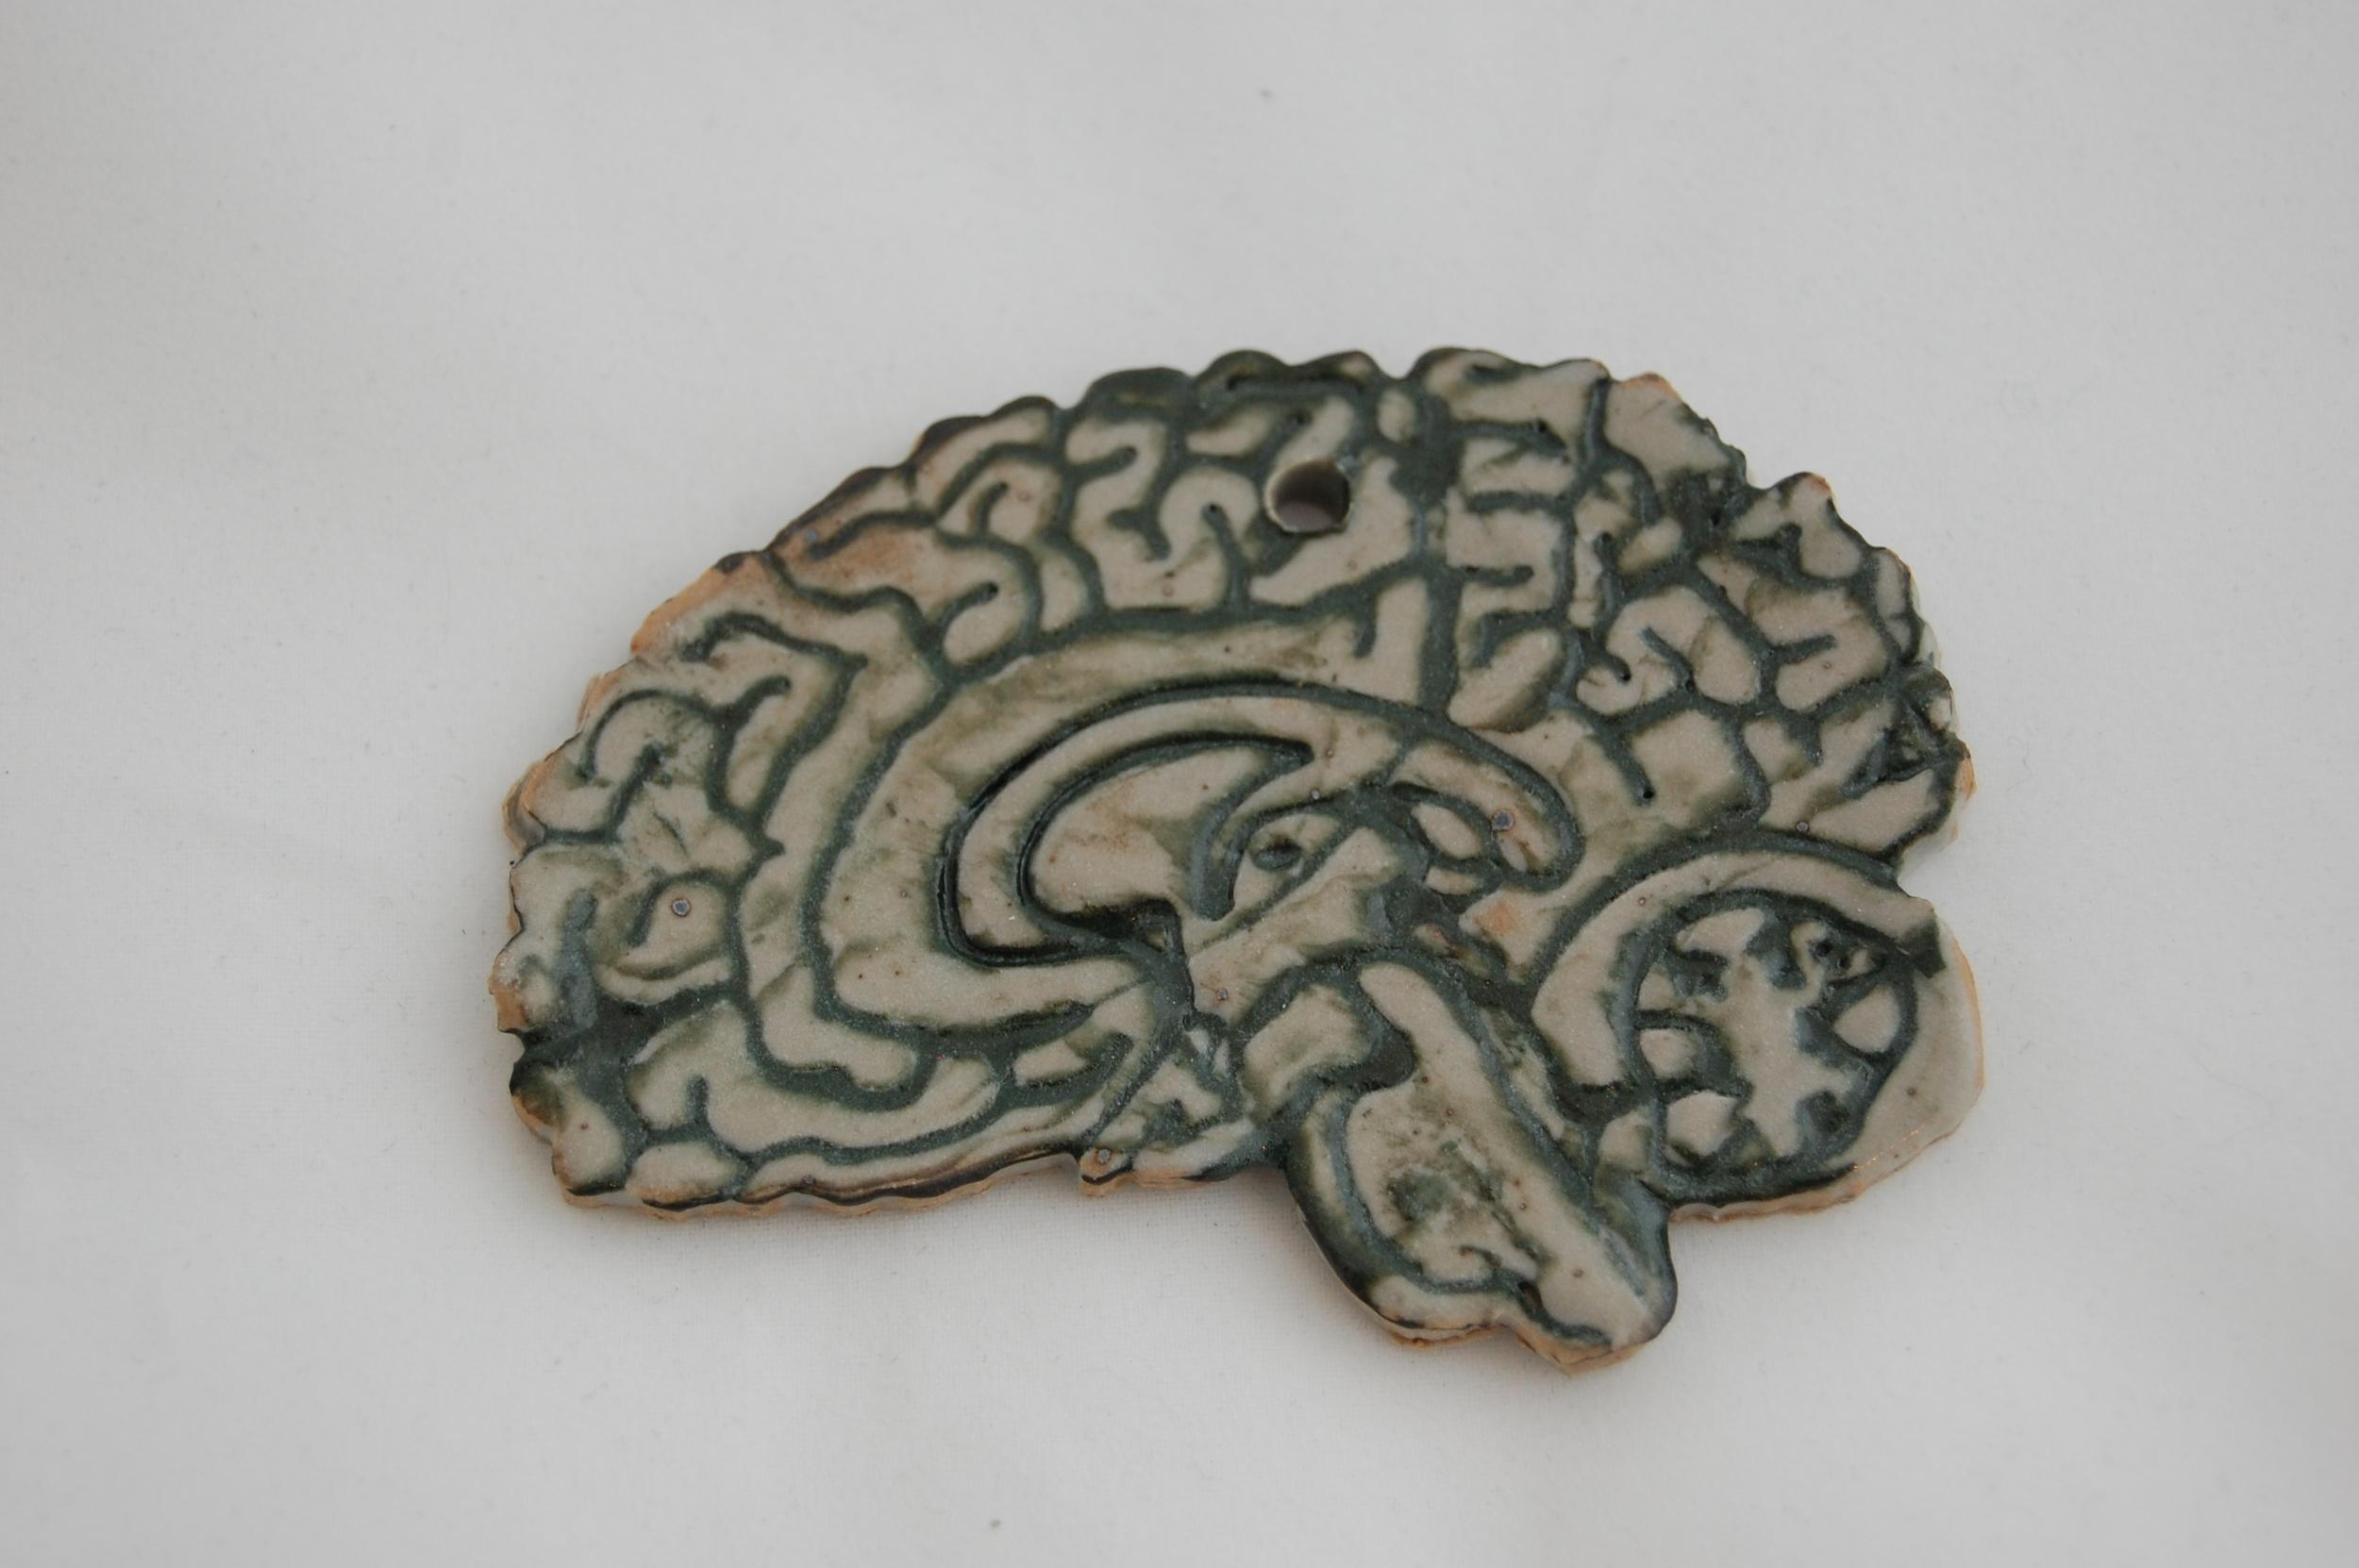 Brain Ornament 3.JPG